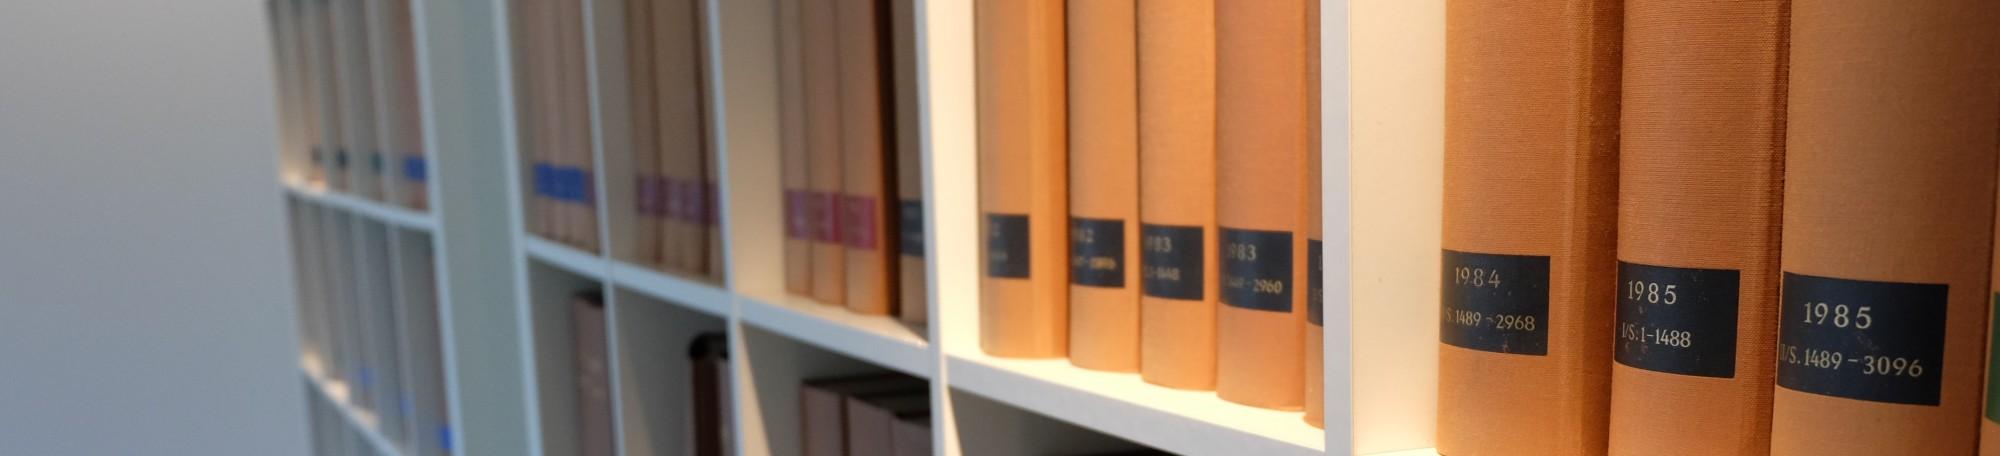 Anwaltskanzlei Eckhardt  –  エッカート法律事務所